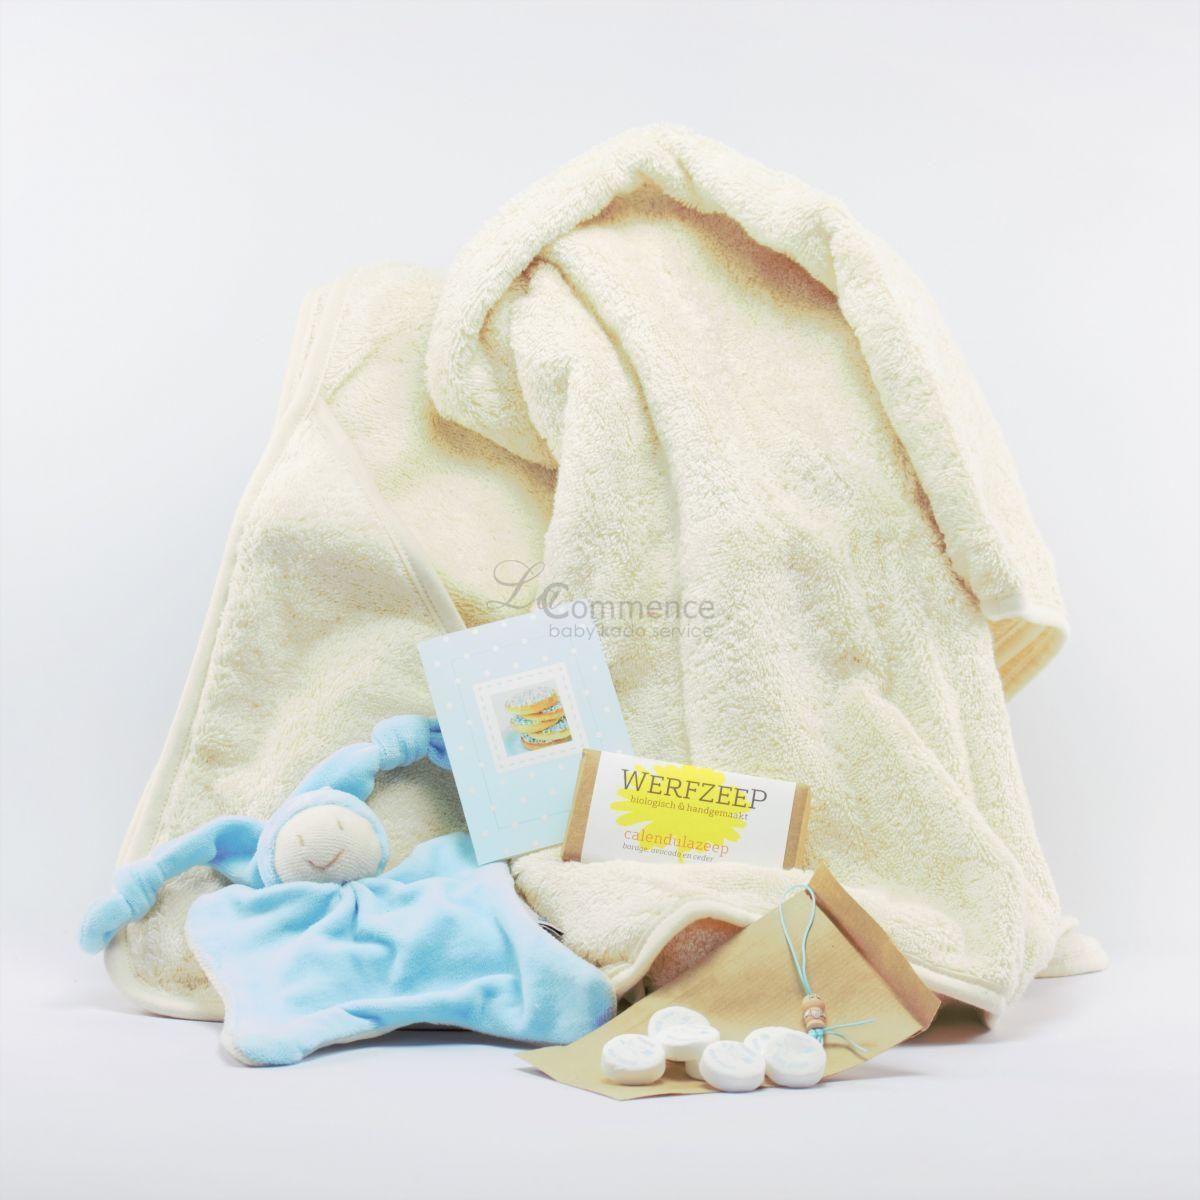 duurzaam babypakket madeliefje